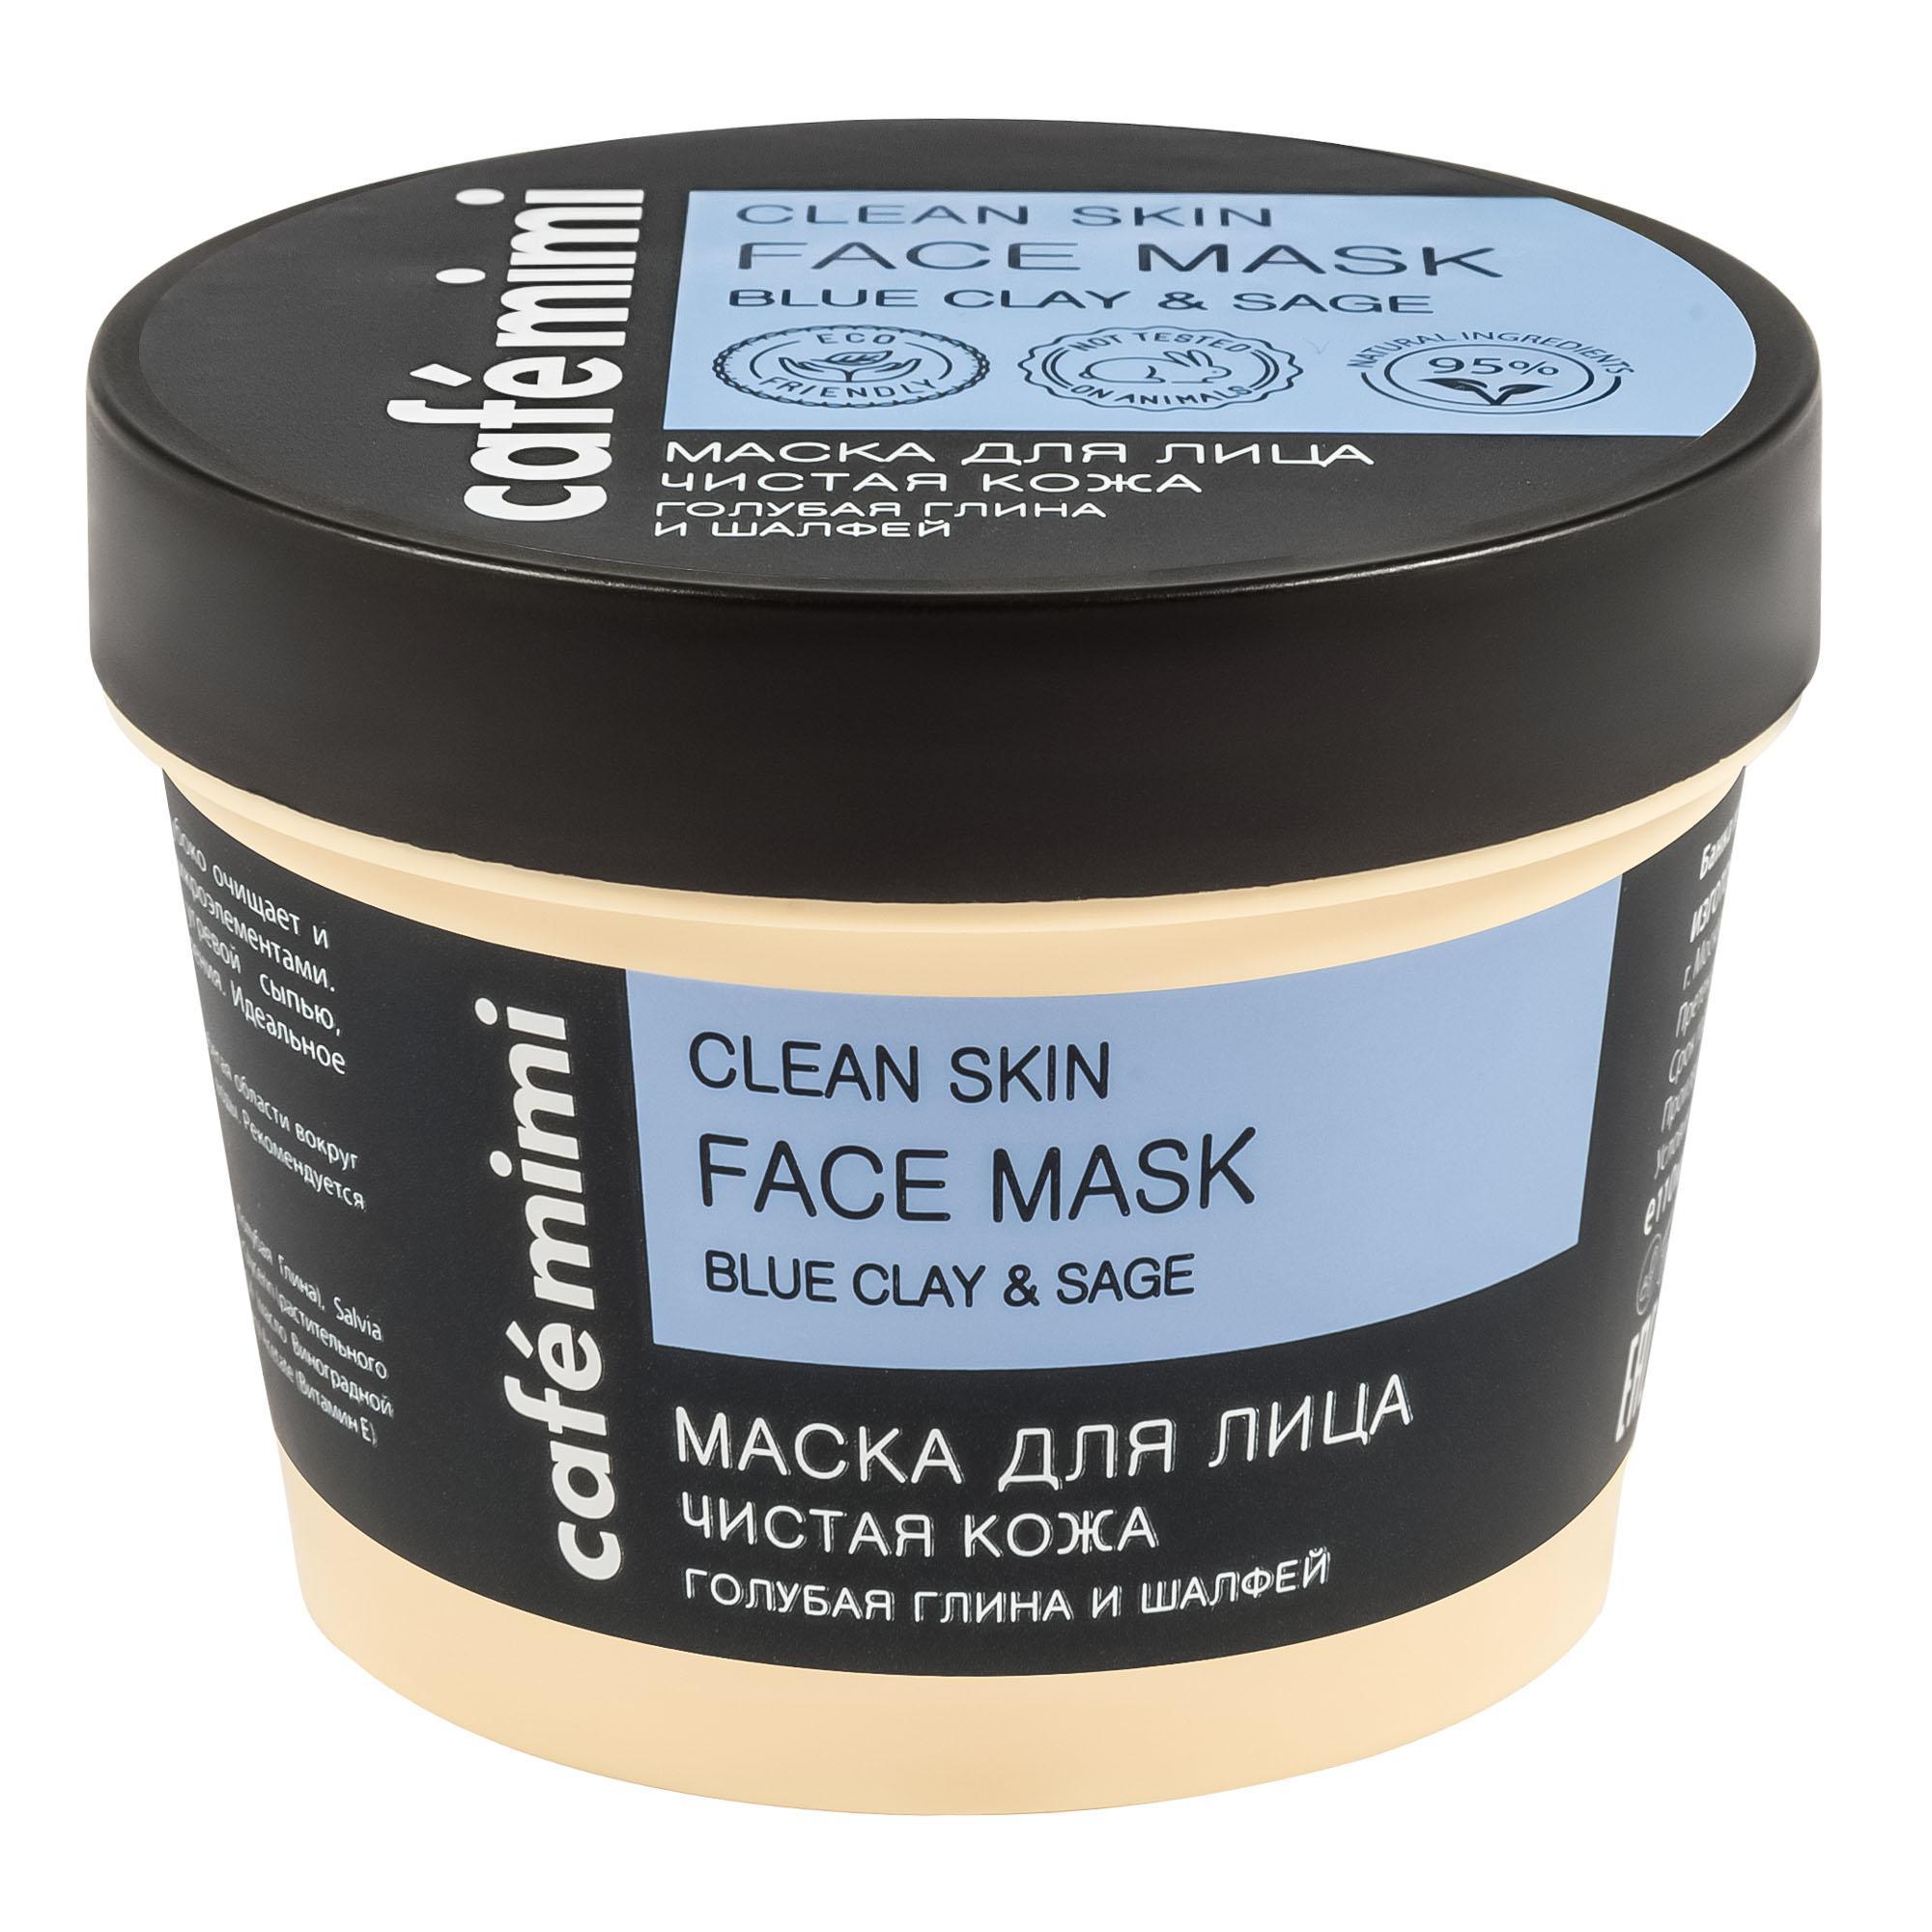 Café Mimi Mascarilla Facial Piel Limpia  110 ml